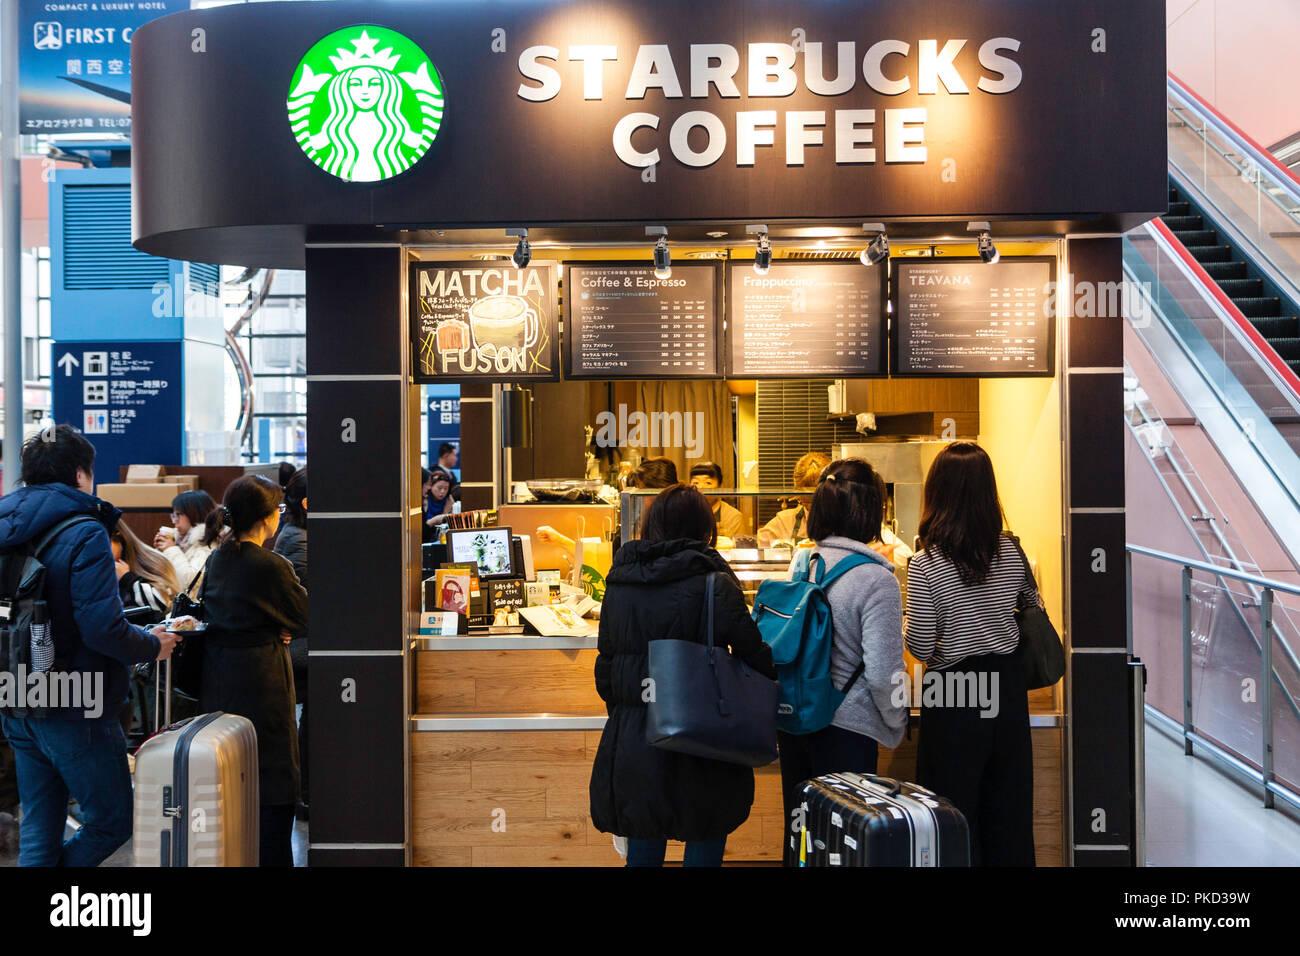 Japan, Osaka. Kansai International Airport. KIX, Interior terminal one, ground floor arrival area. Starbucks coffee shop with people at counter. - Stock Image